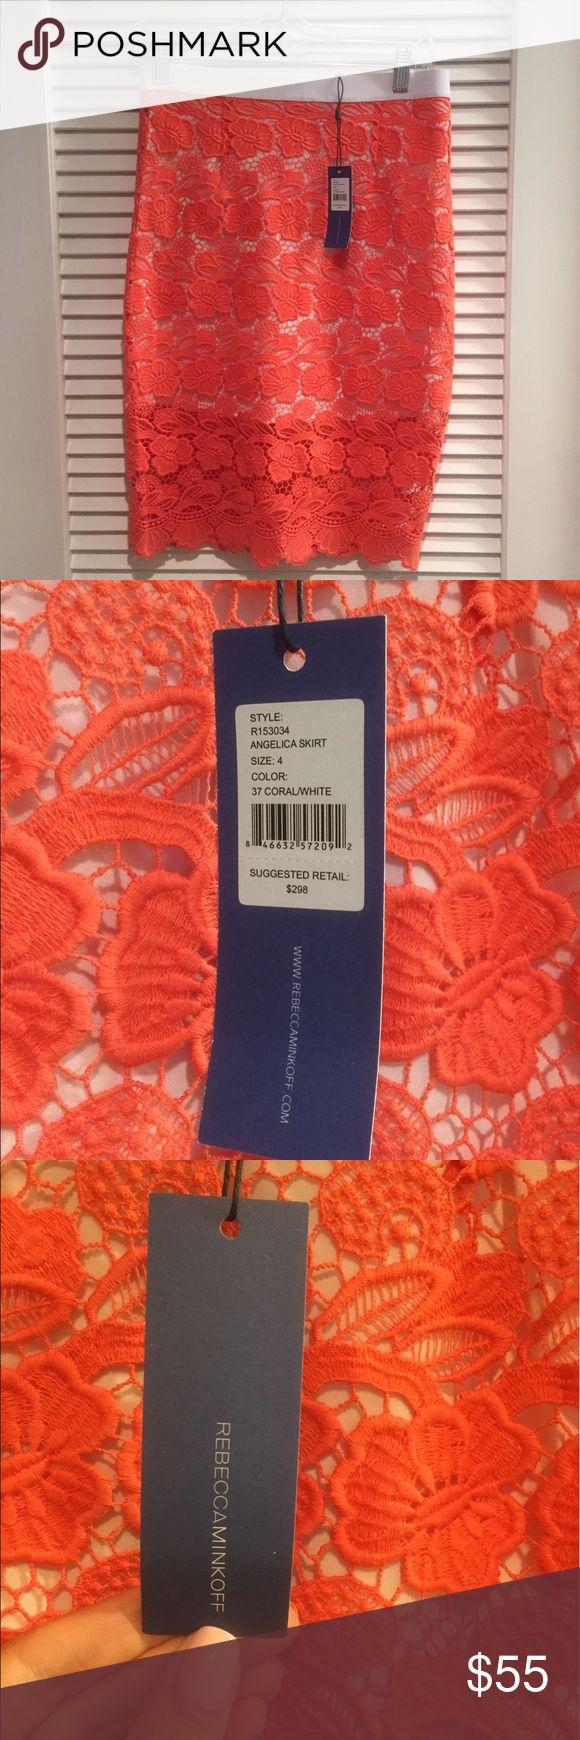 Rebecca Minkoff Coral Crochet Skirt, Size 4 NWT Rebecca Minkoff coral colored crochet pencil skirt, size 4.  Never worn, perfect condition.  Original price $298. Rebecca Minkoff Skirts Pencil